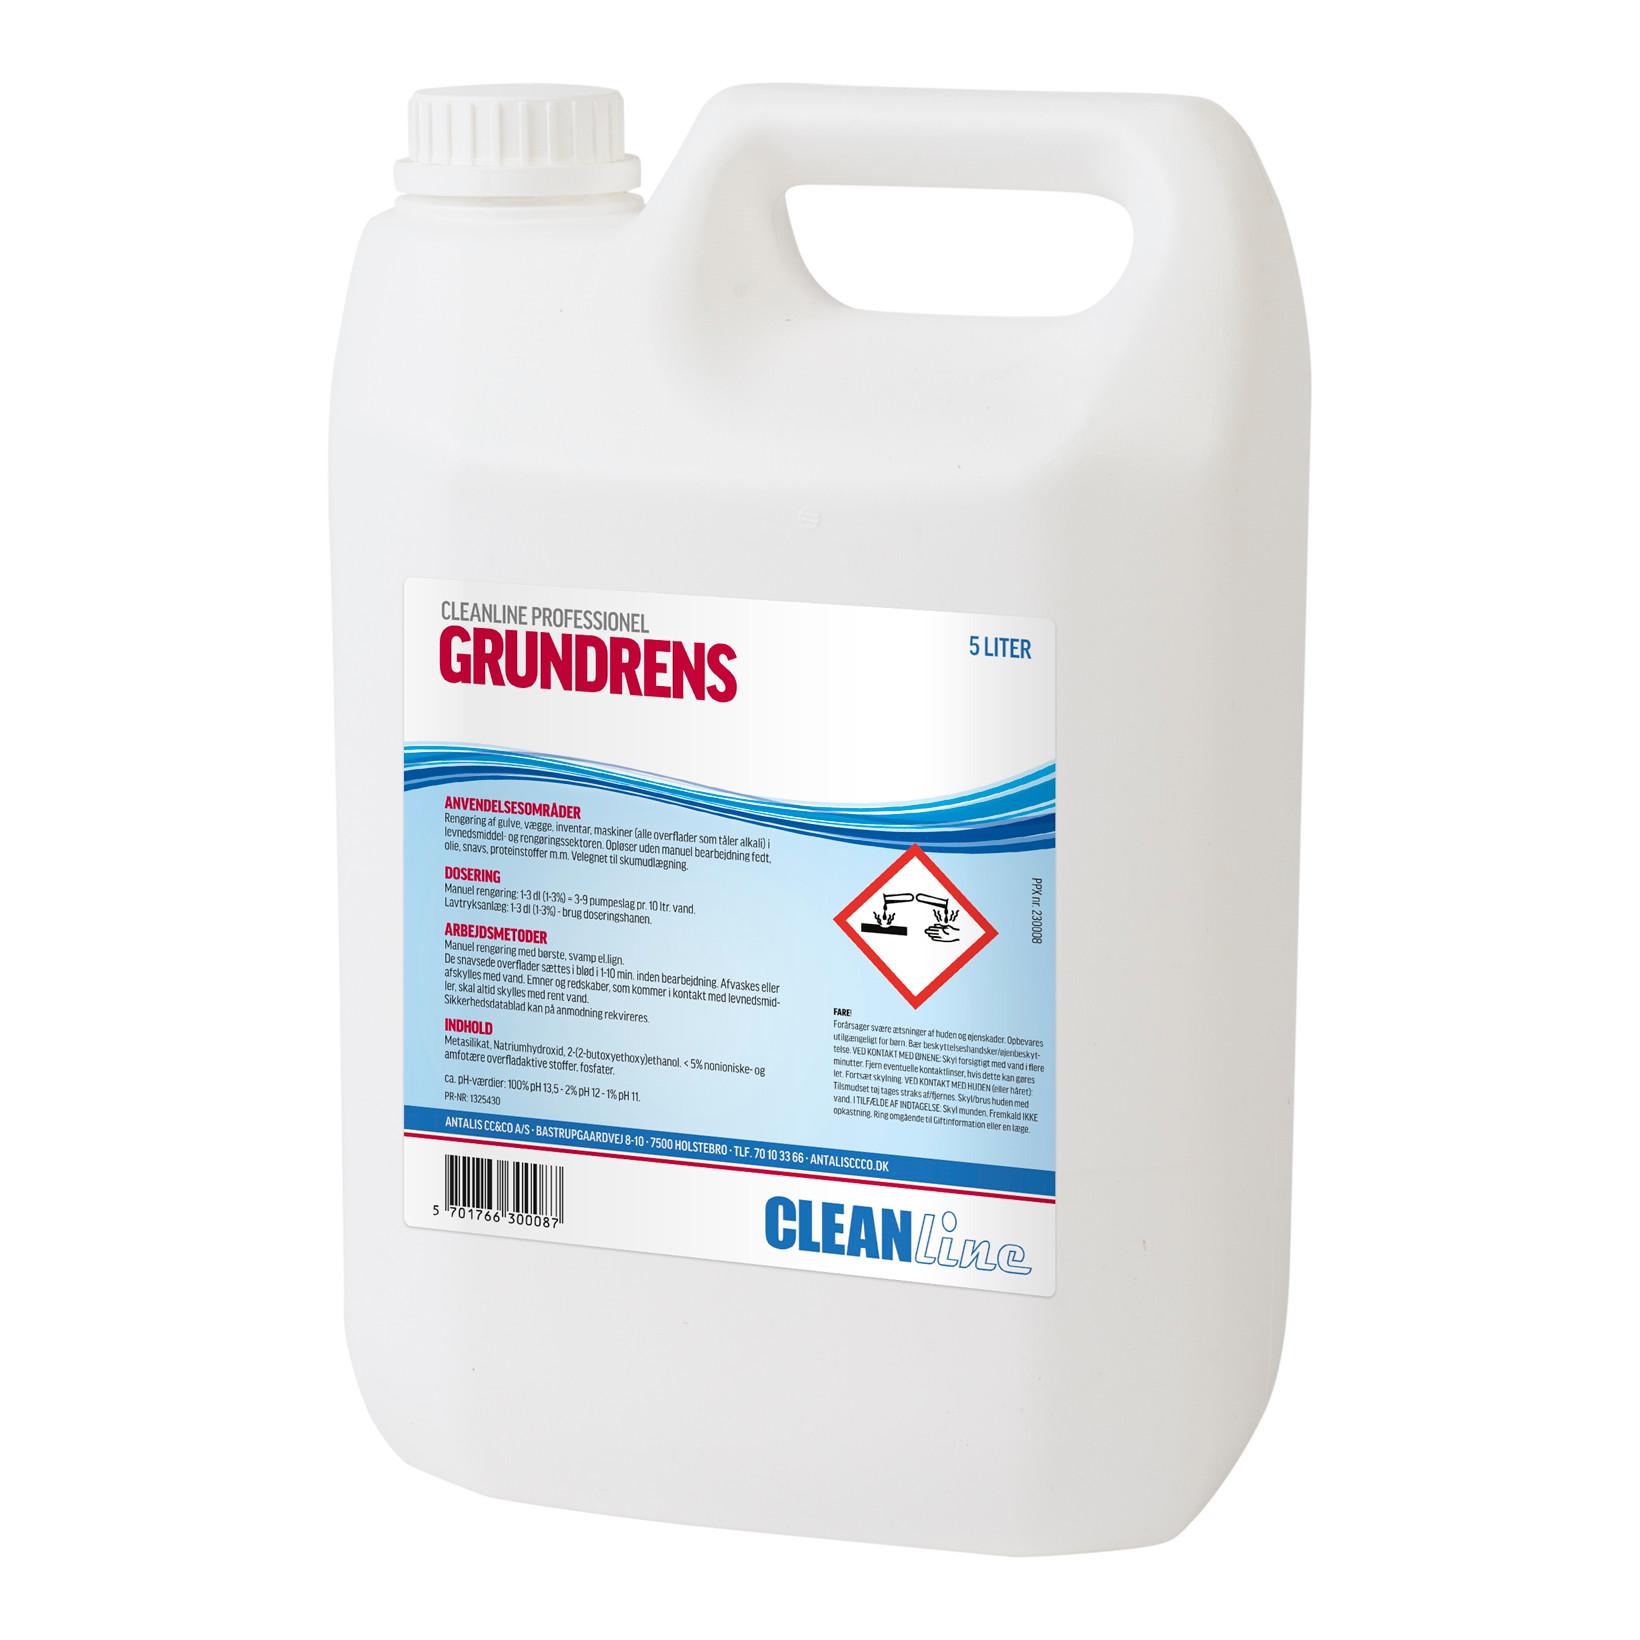 Cleanline Grundrens - Grundrengøringsmiddel - 5 liter